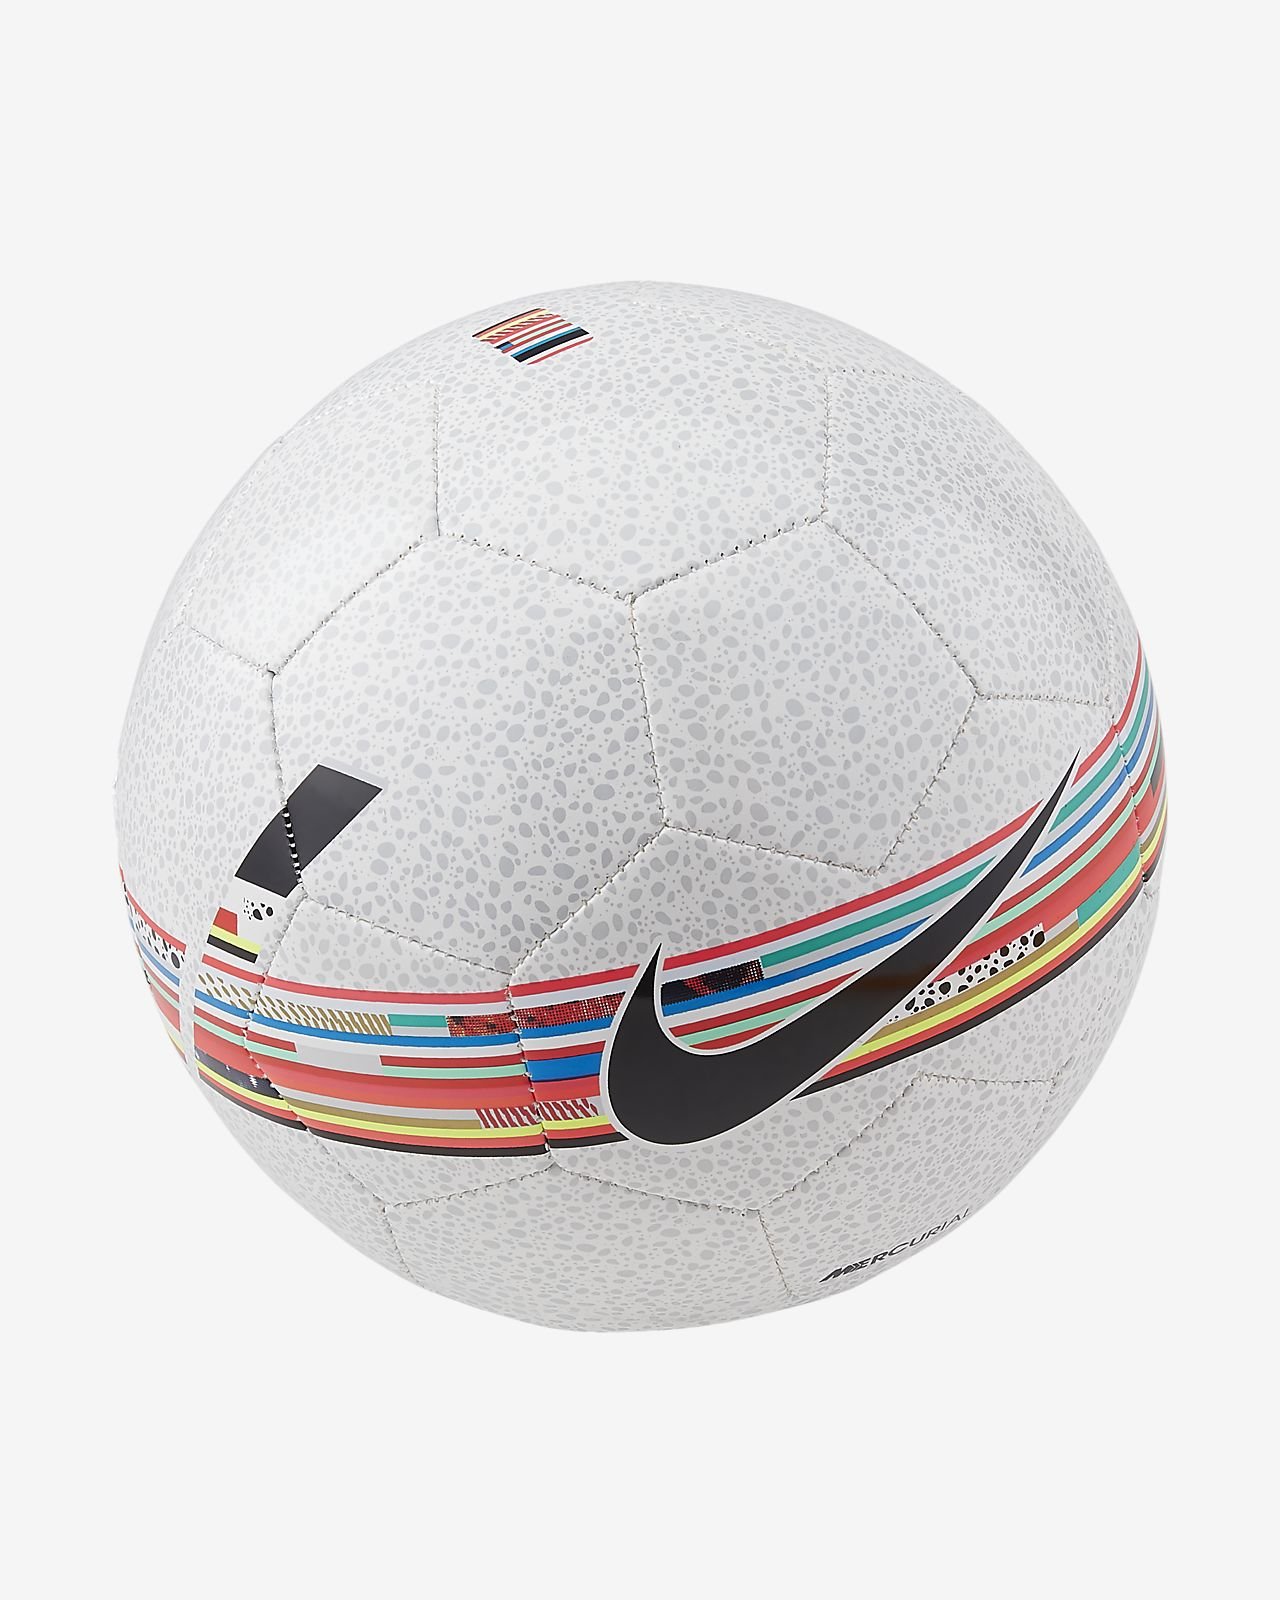 Ballon de football Nike Mercurial Prestige